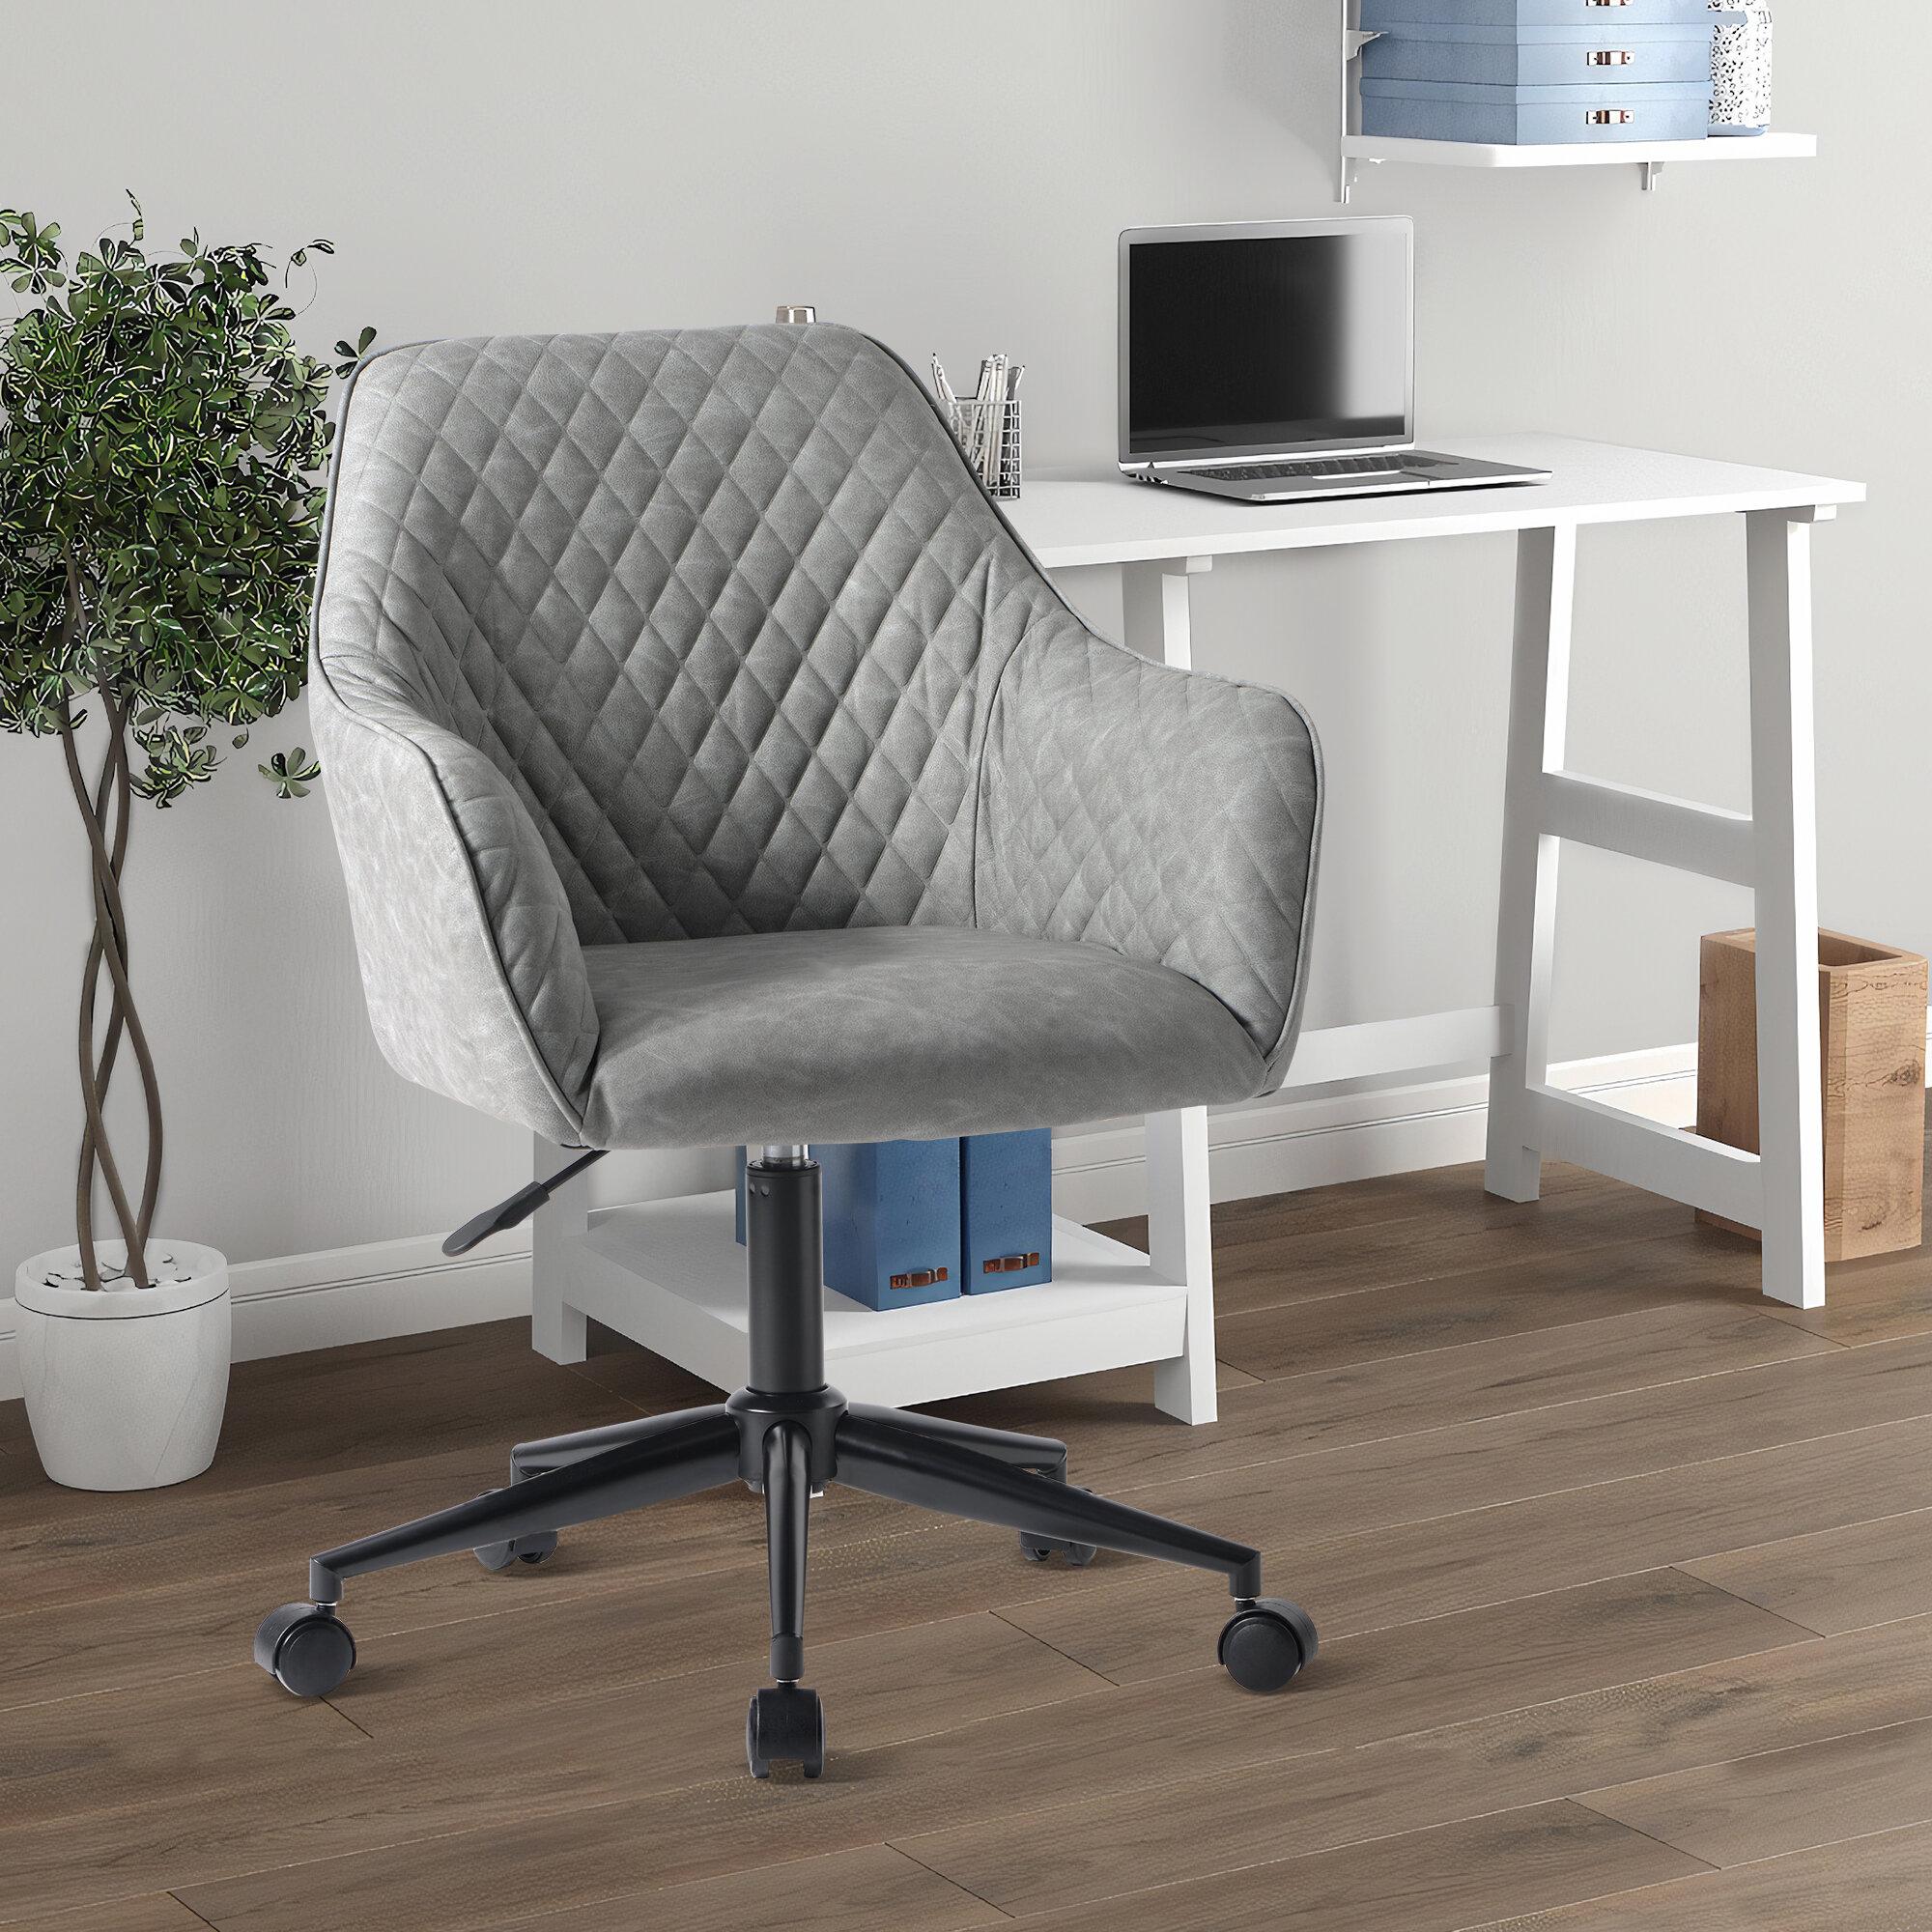 Ebern Designs Parchure Upholstered Desk Chair Reviews Wayfair Co Uk